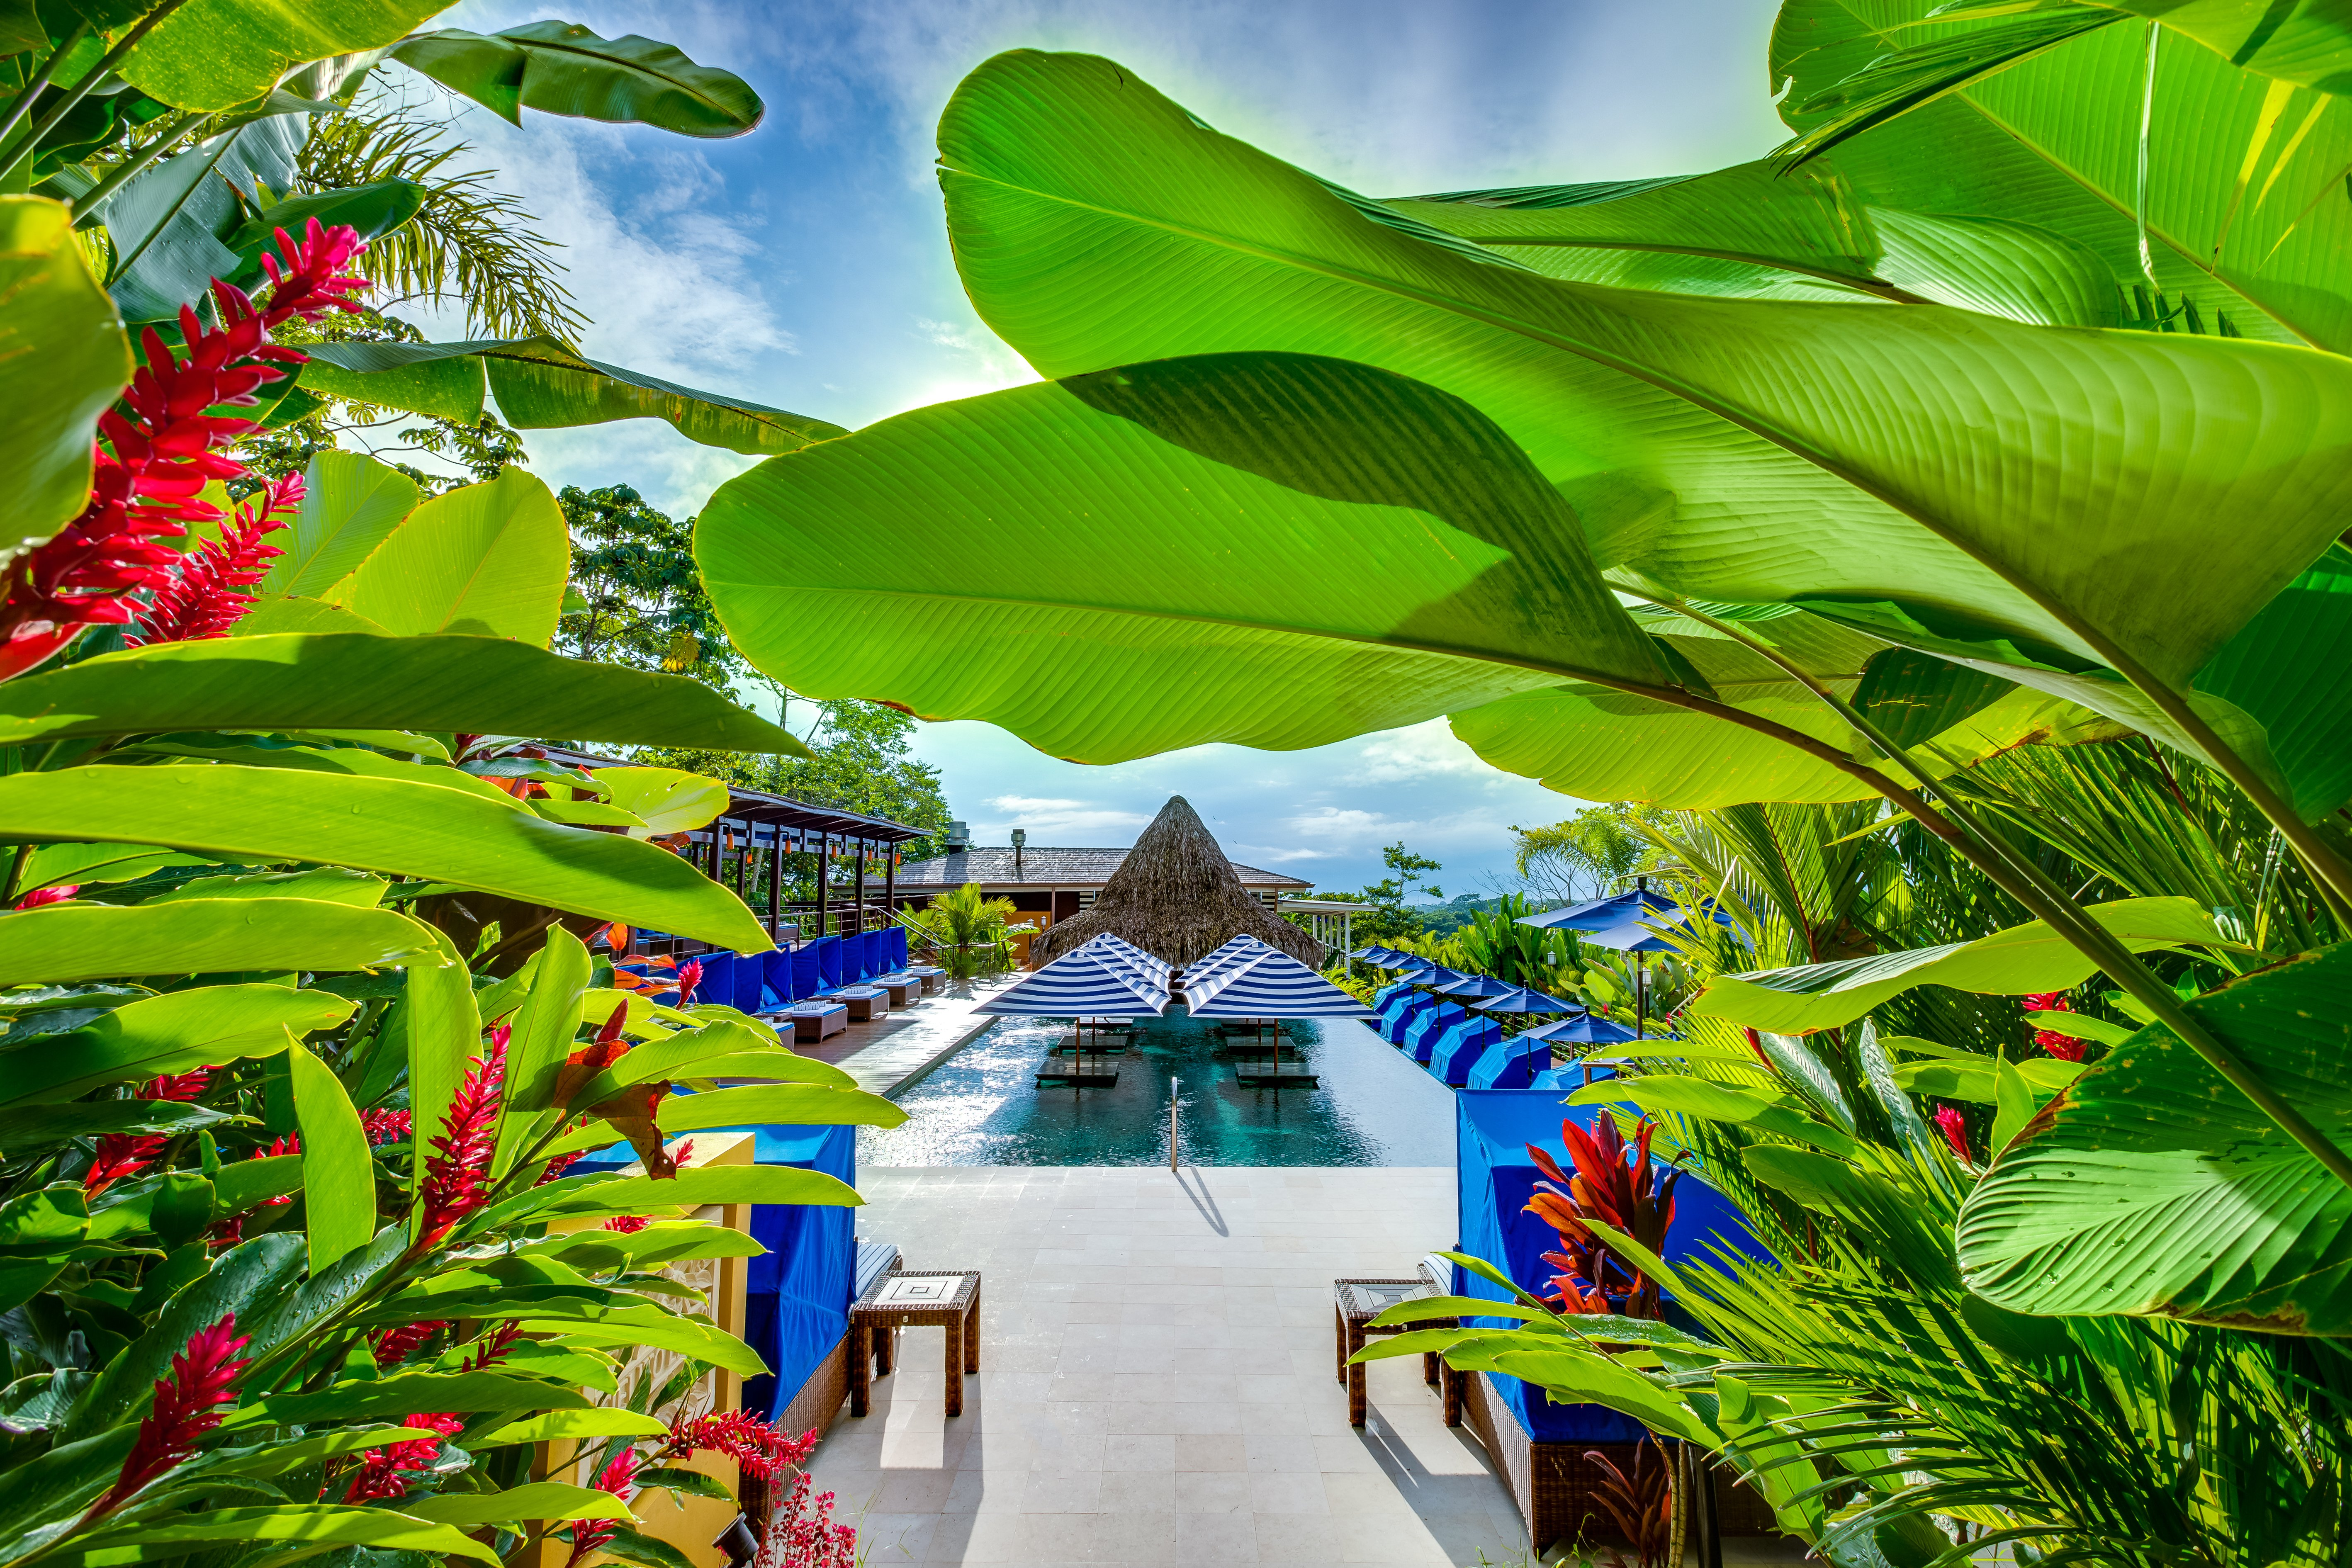 nayara-springs-luxury-boutique-hotel